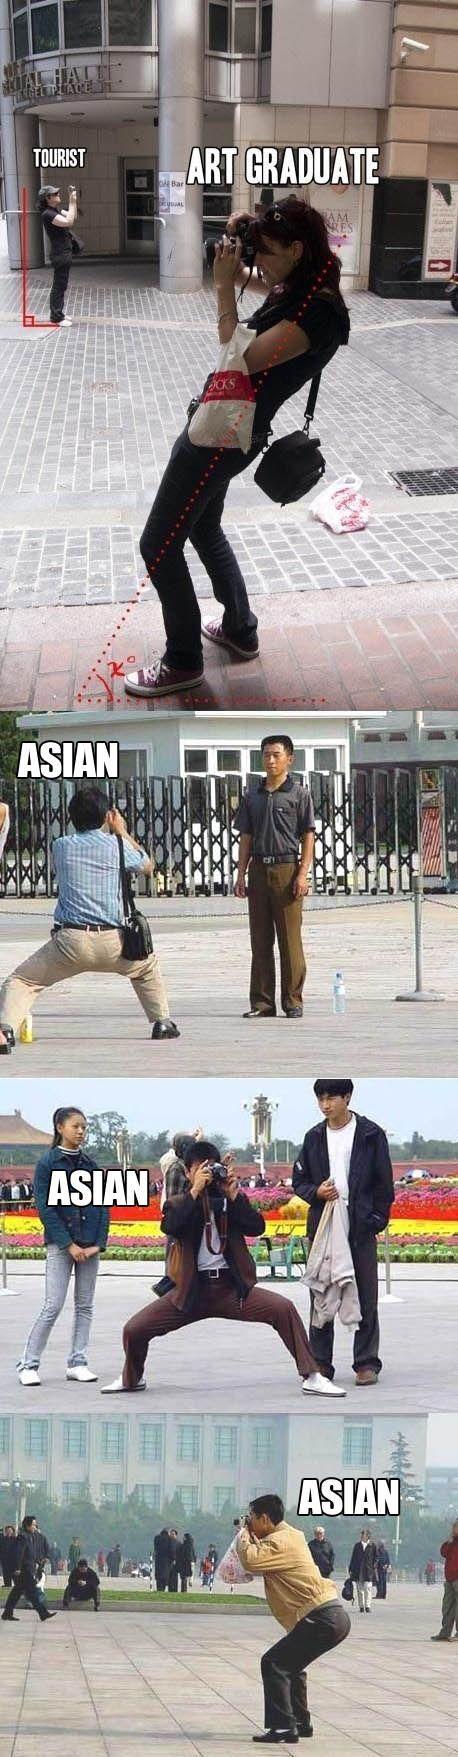 Asian. haha!